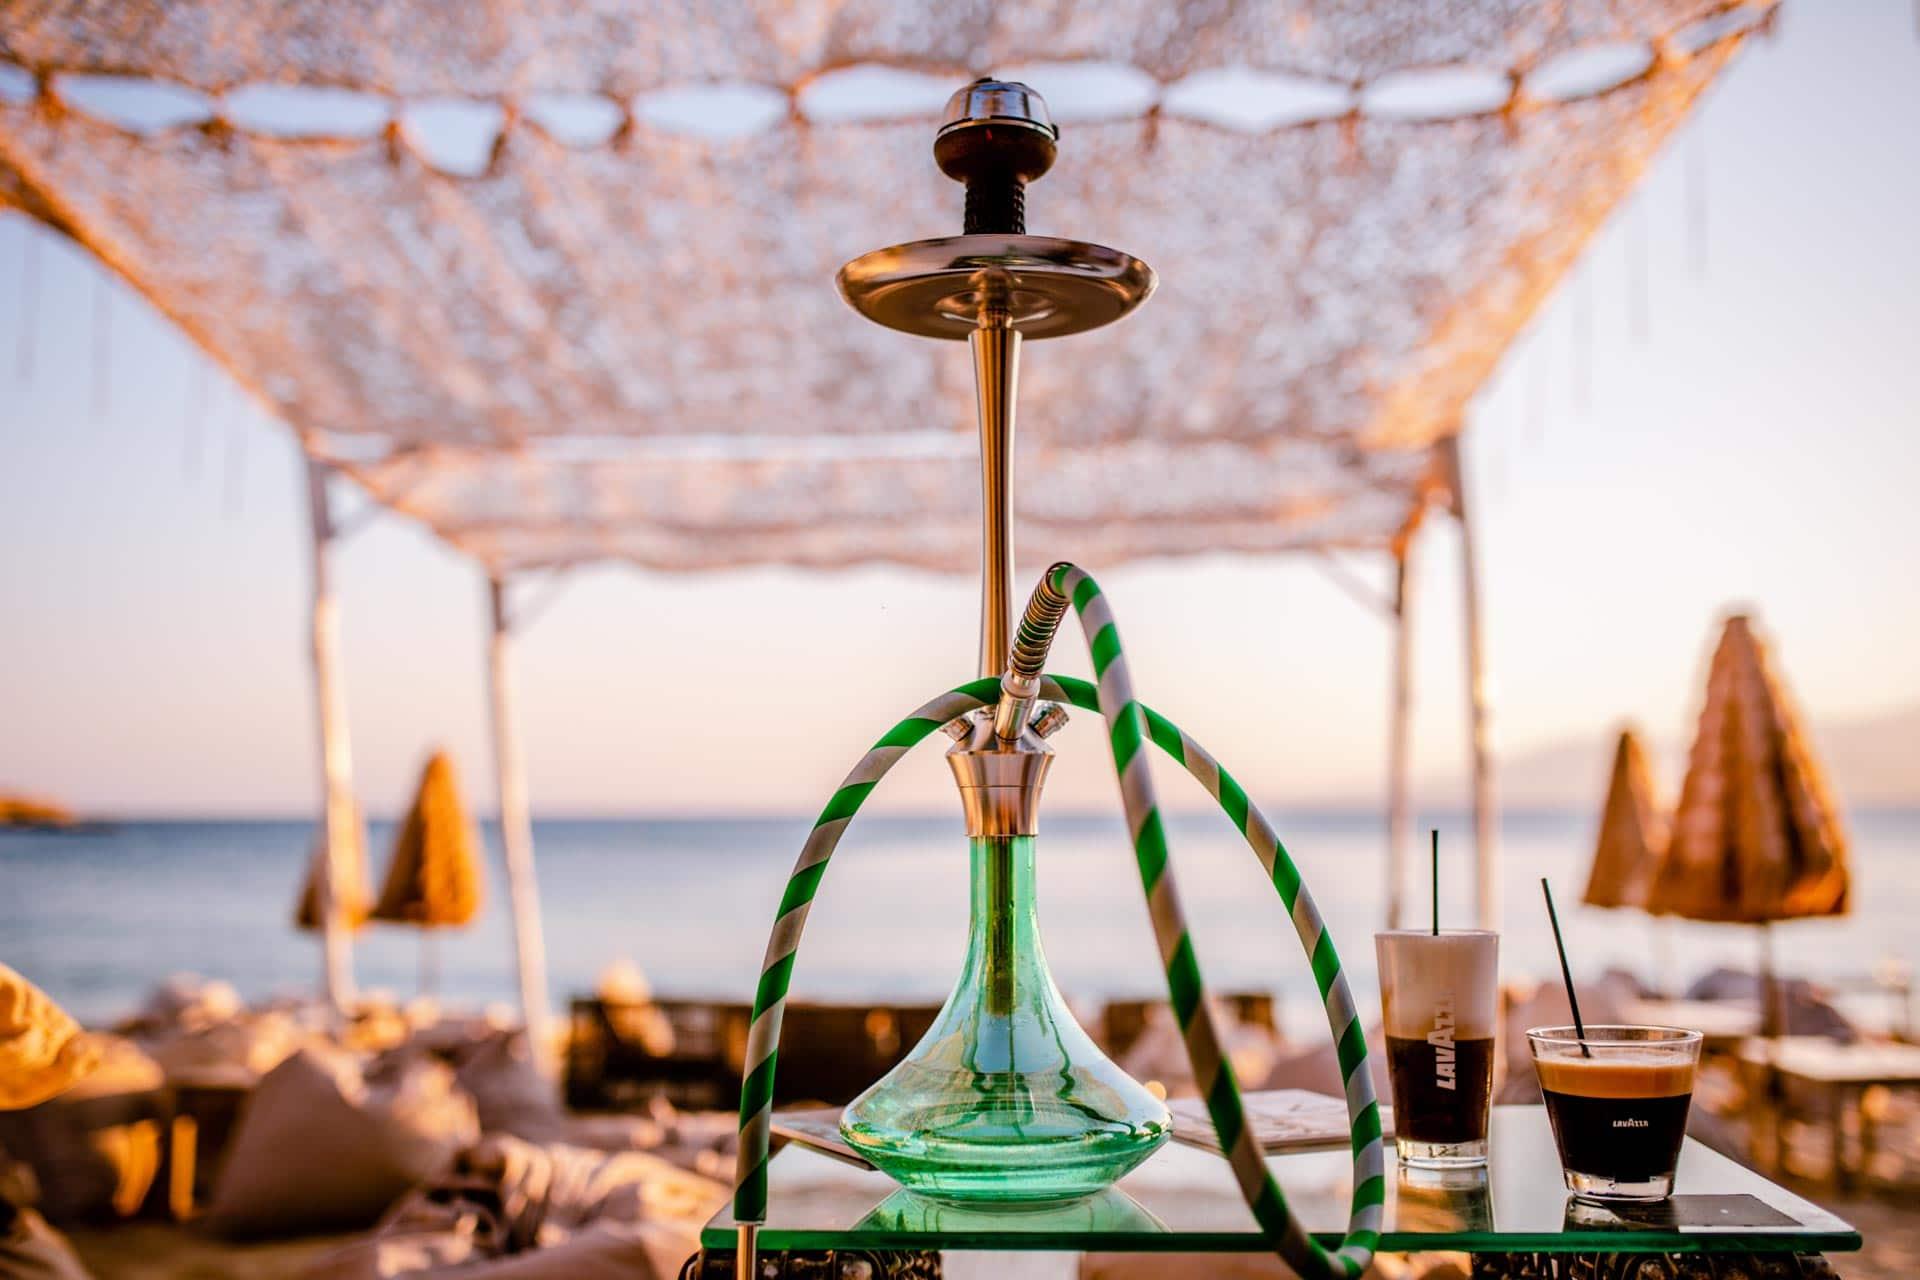 santana-beach-agia-anna-naxos-1